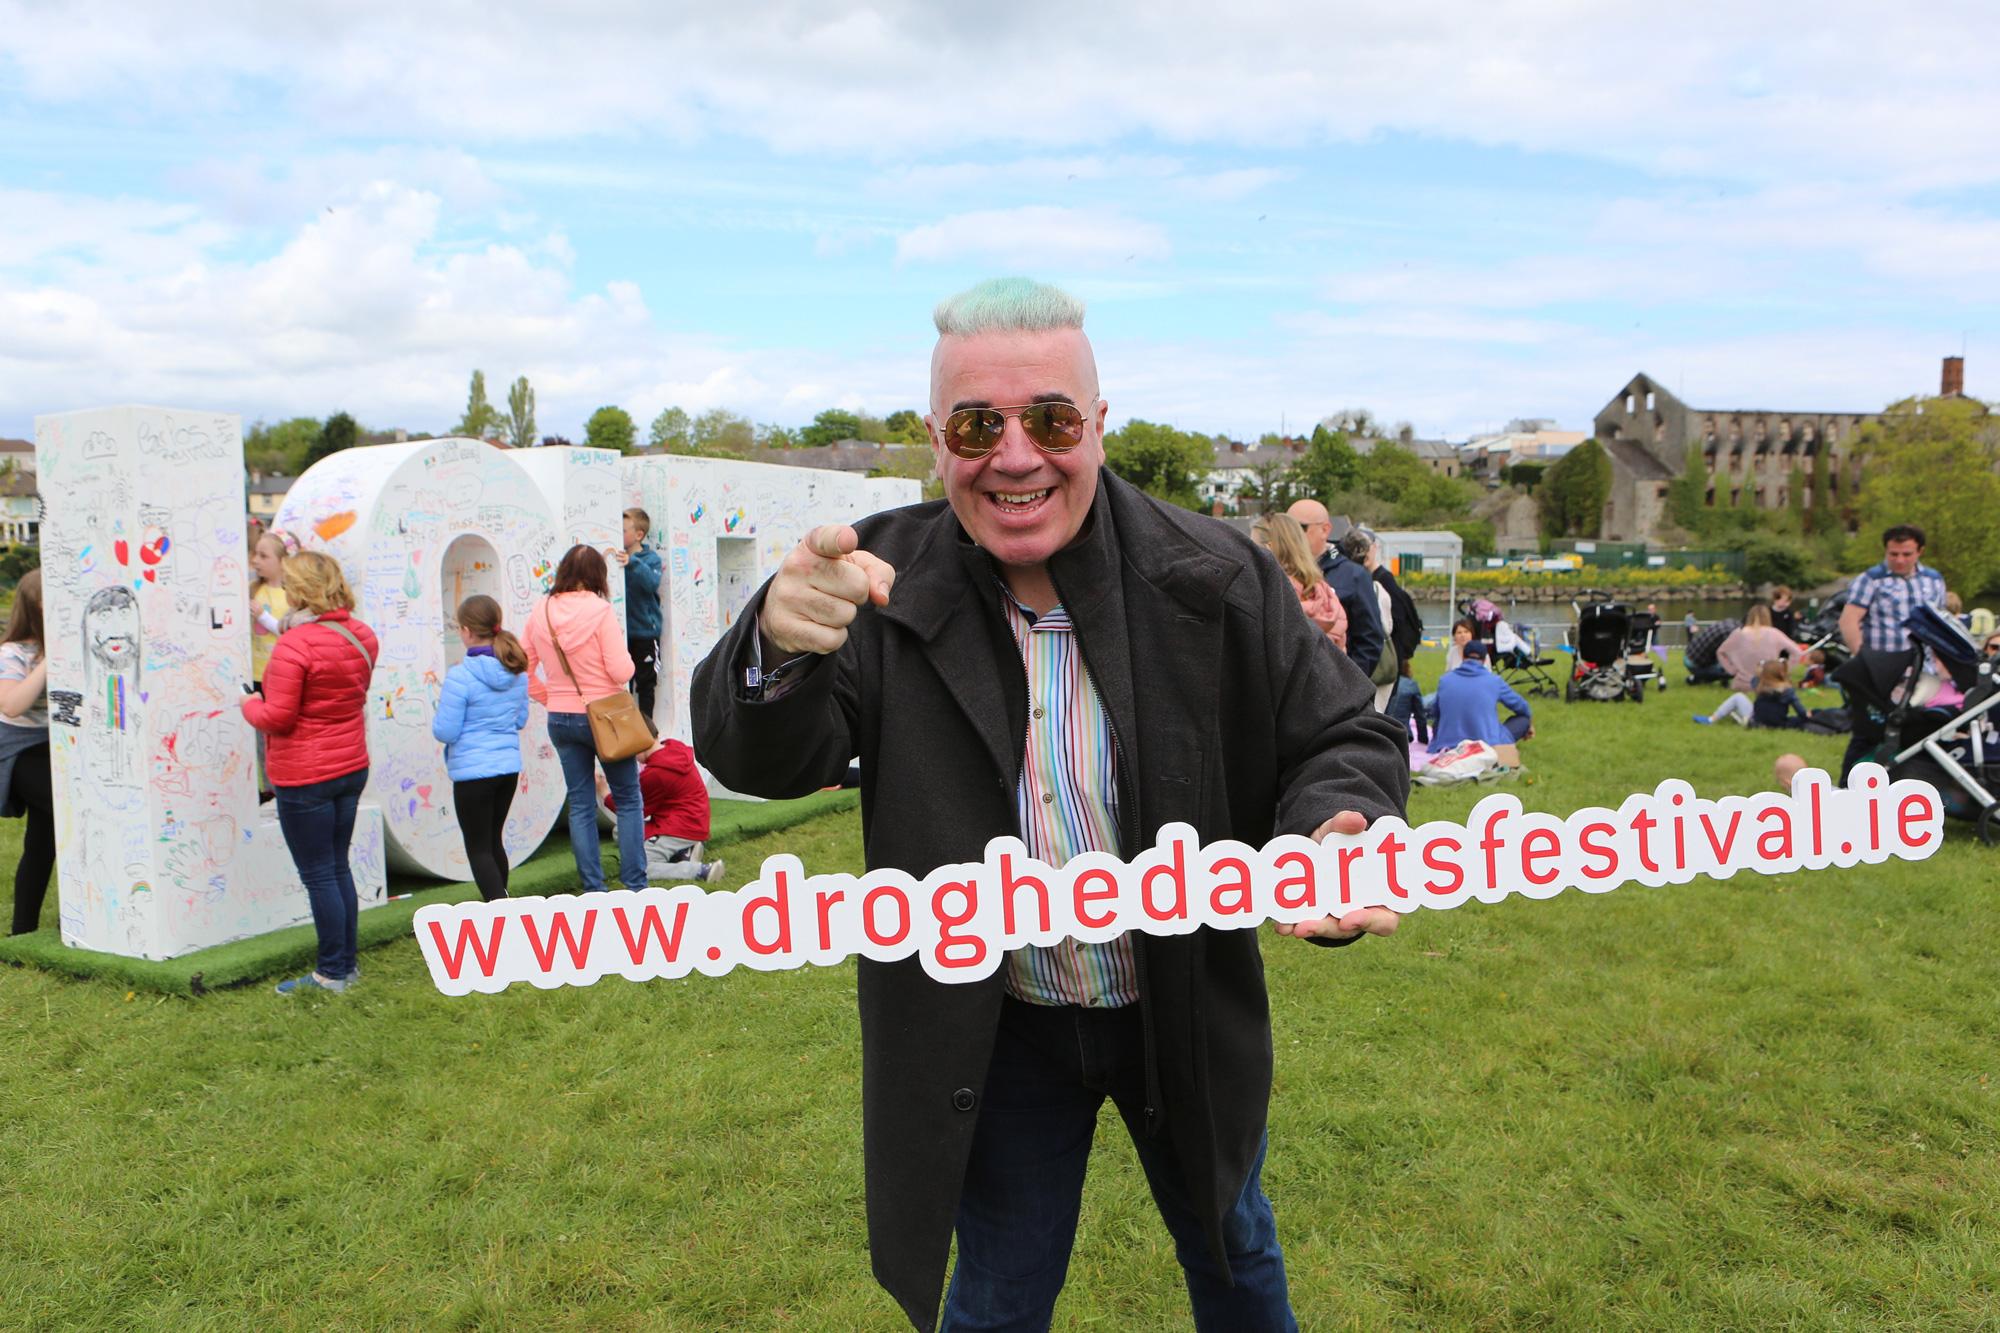 Drogheda Arts Festival 2019, Jenny Callanan Photography, Drogheda, Co.Louth